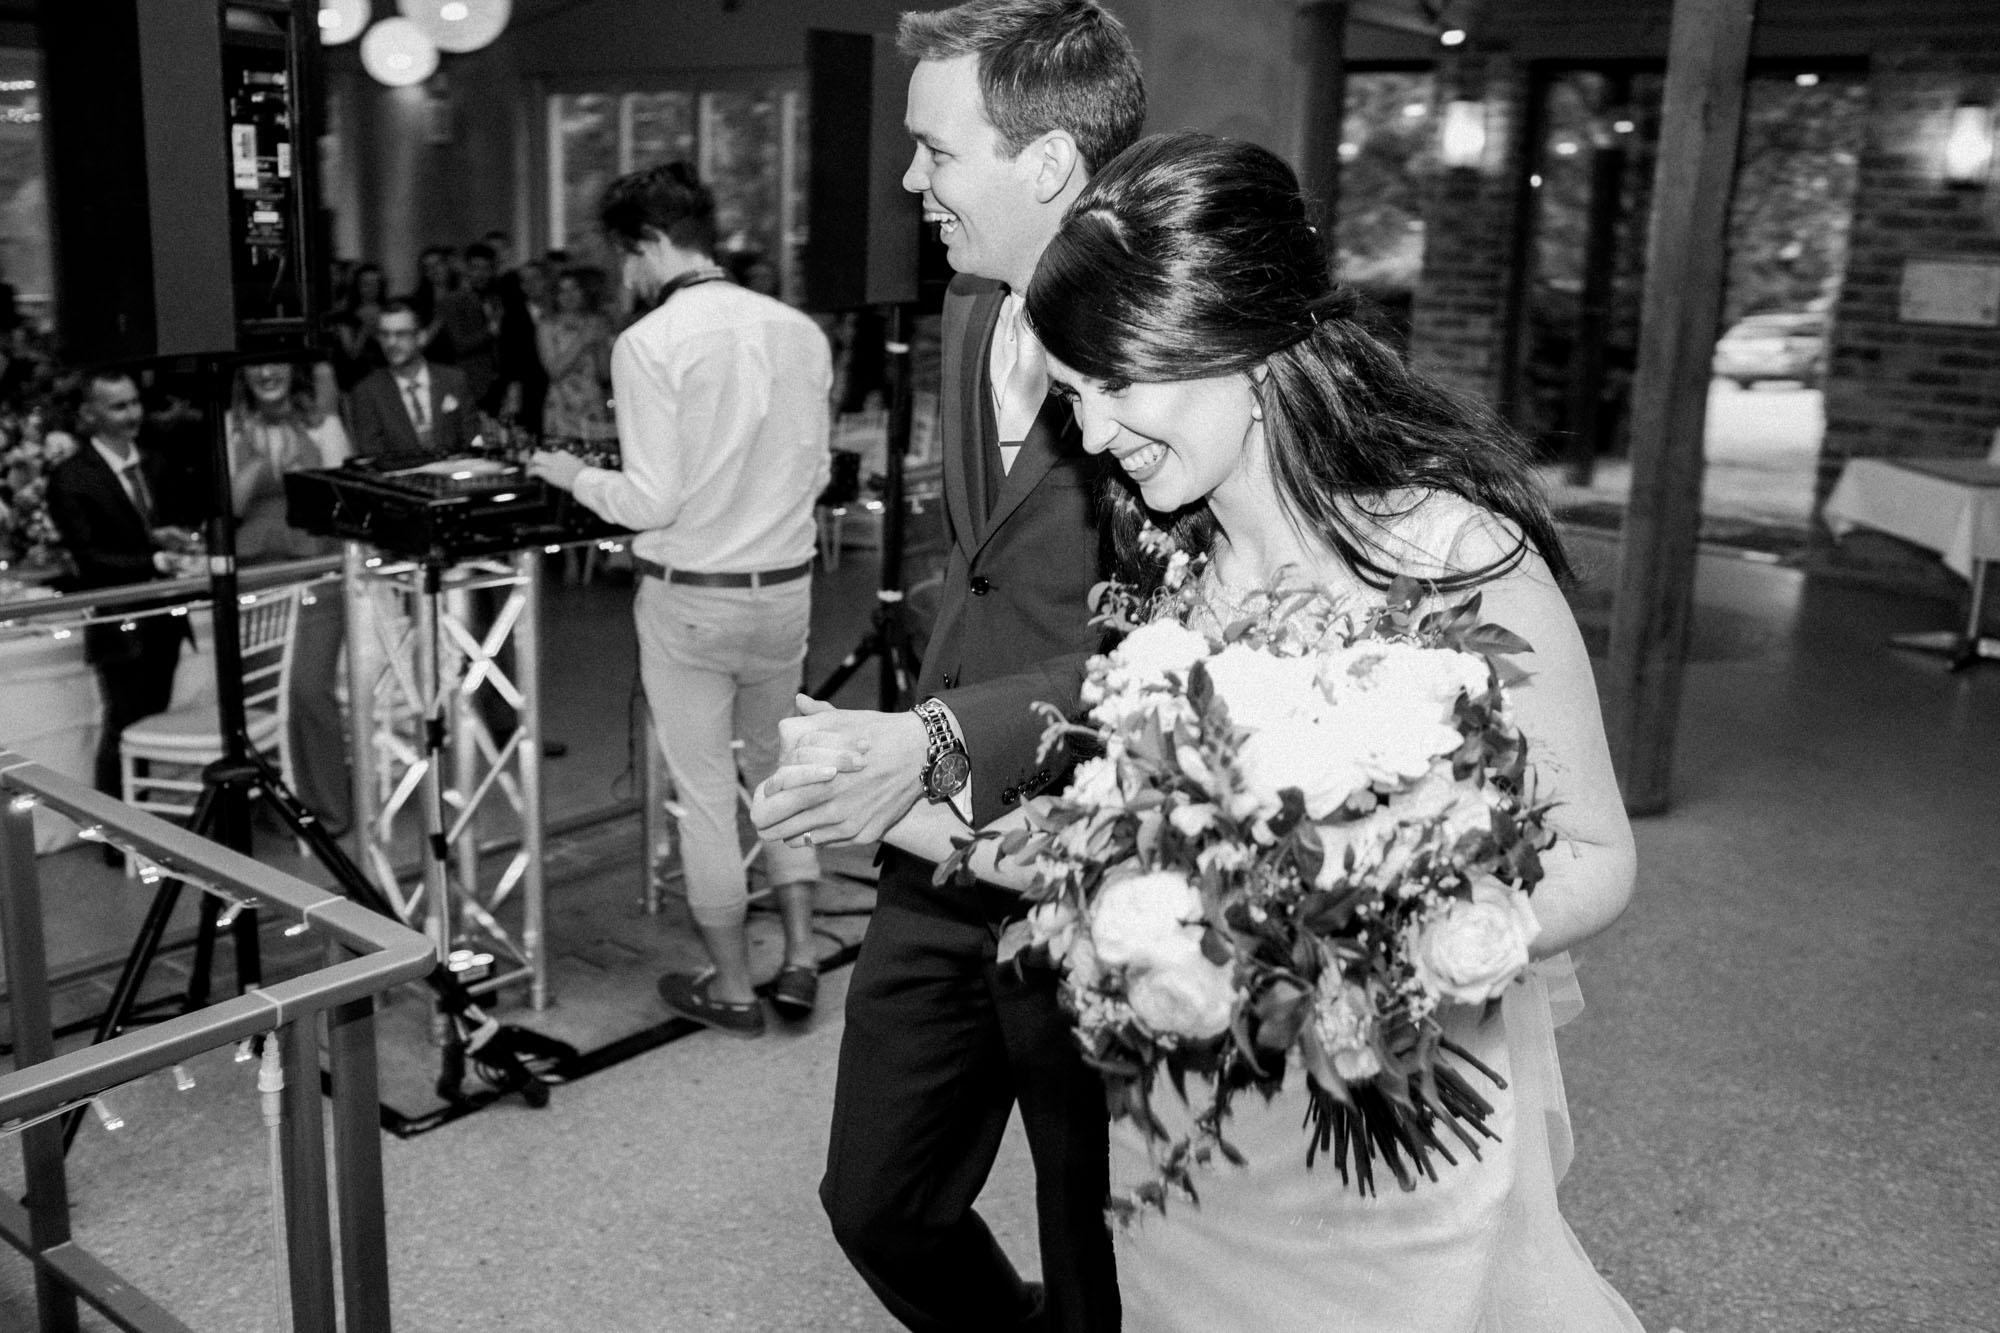 Glen-Ewin-Estate-wedding-photography-078.jpg